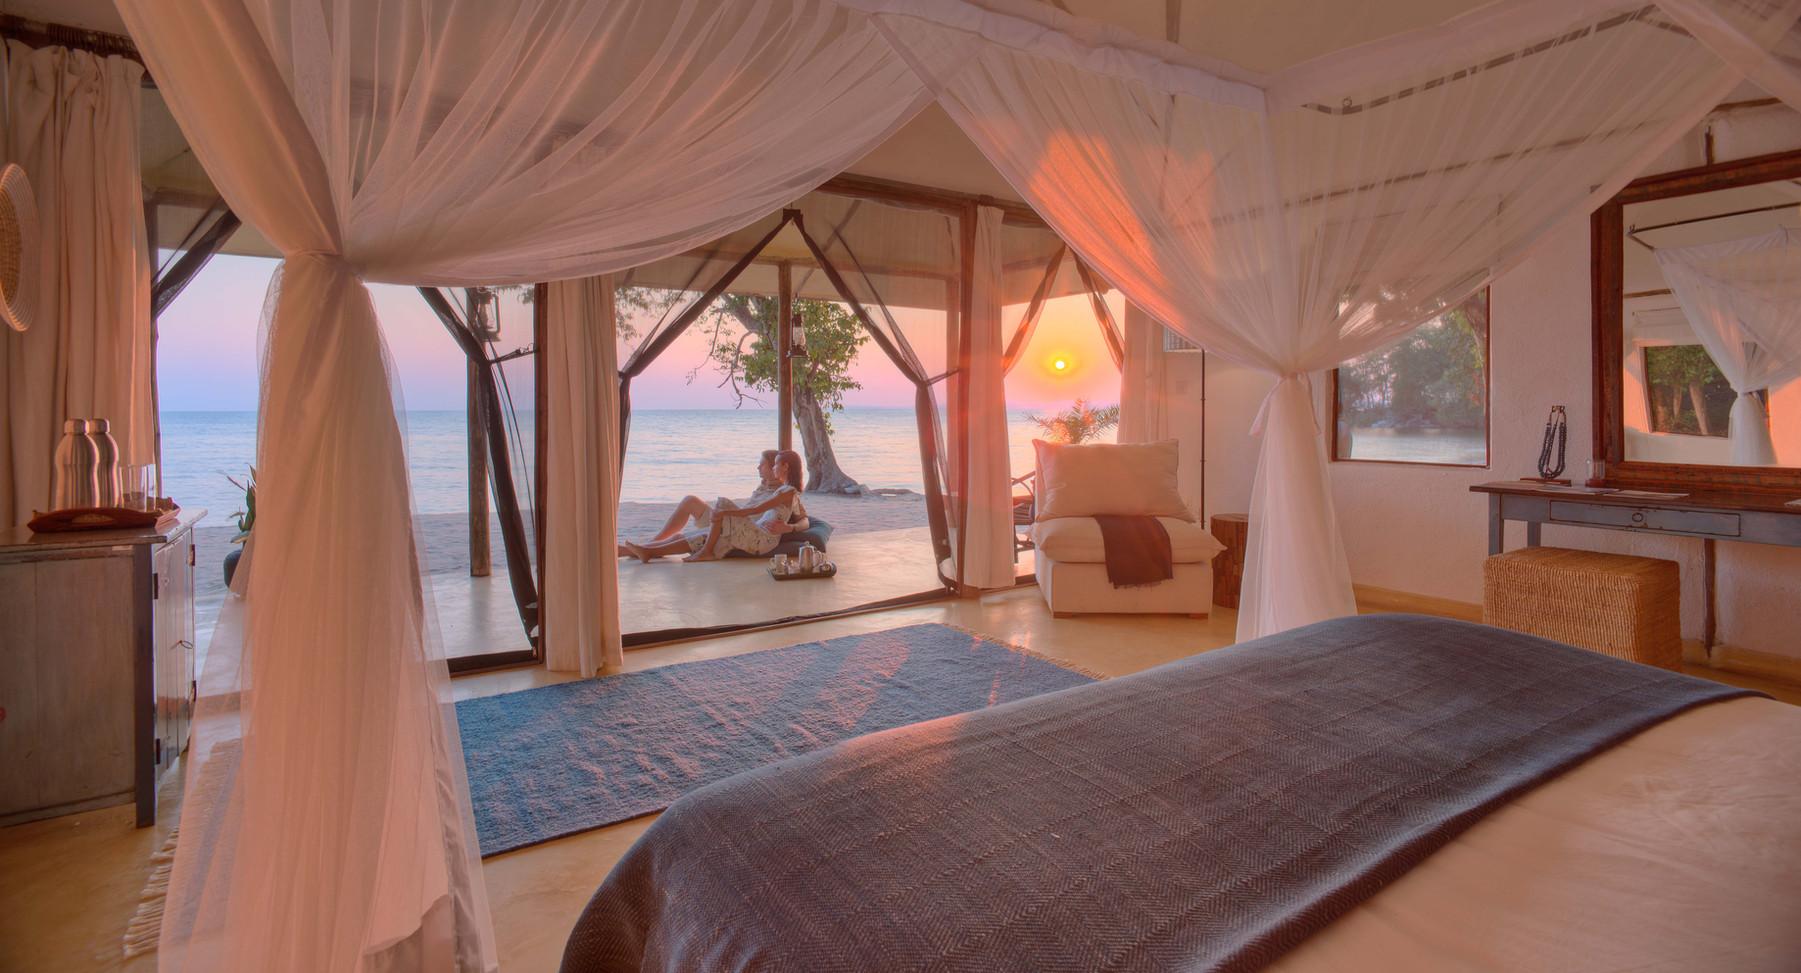 Double Room Rubondo Chimp Island Tanzani